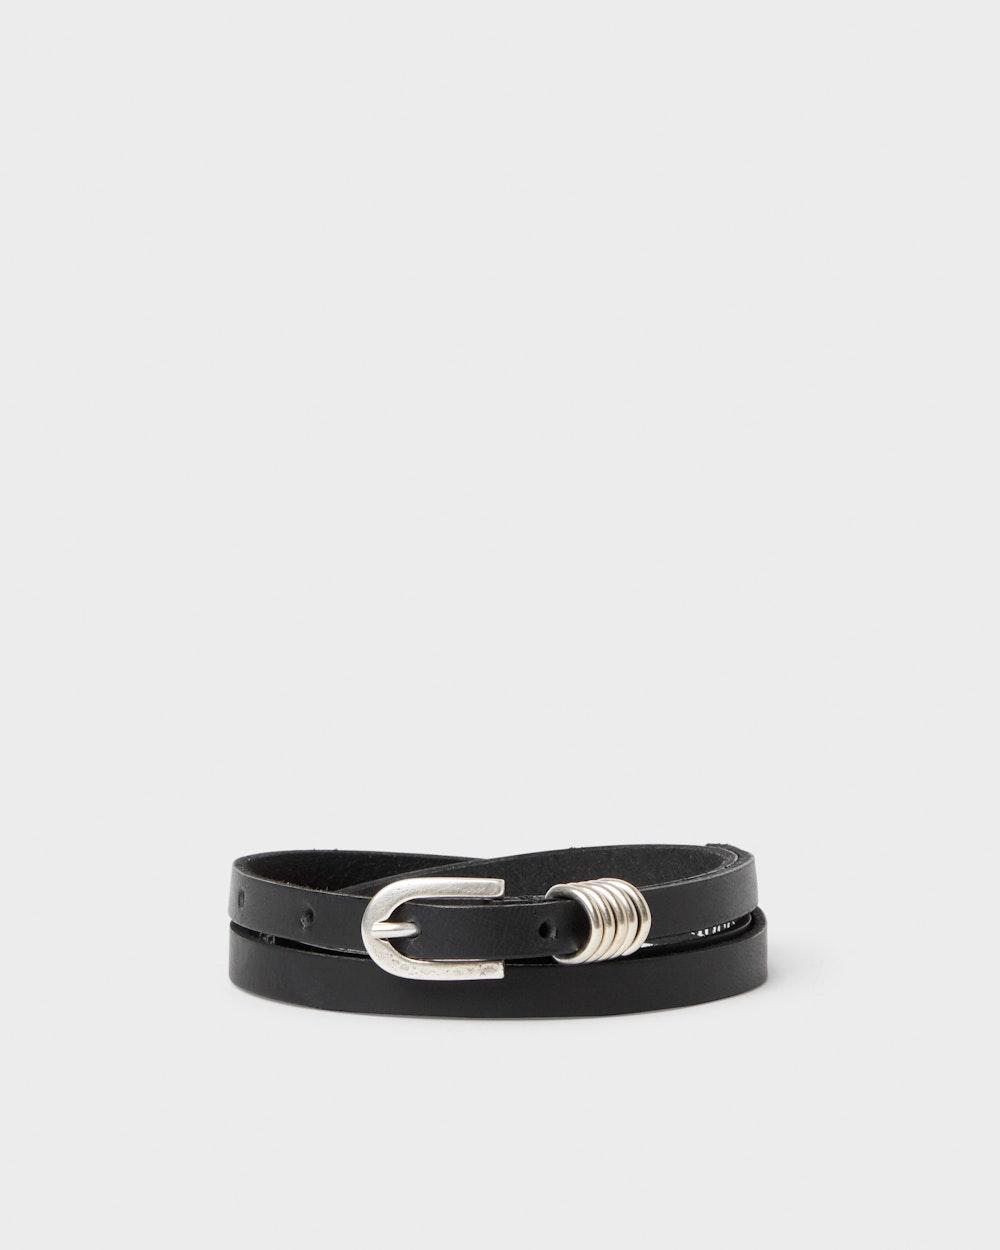 Hokksund belt Black Saddler